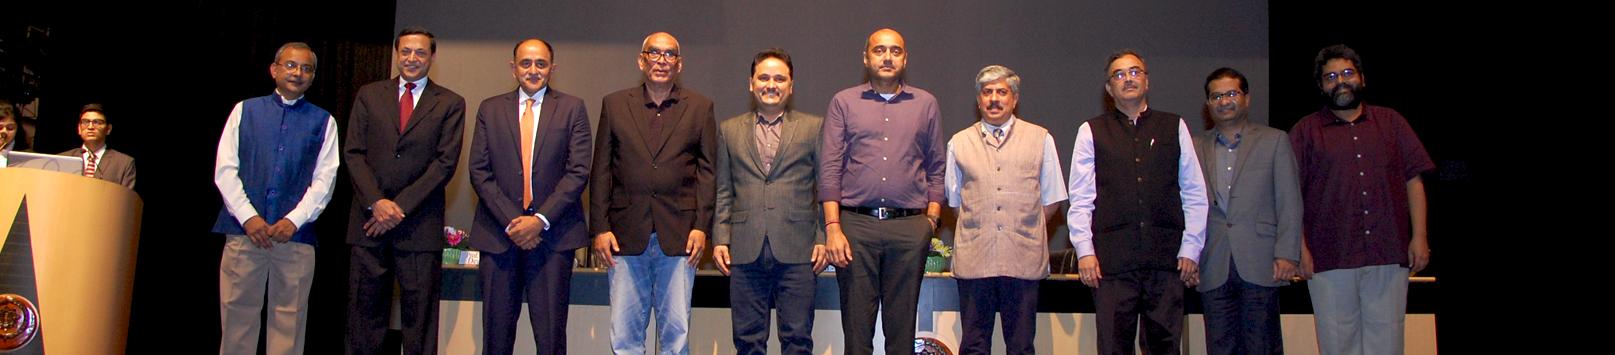 IIM Calcutta proudly offered Distinguished Alumnus Award 2017 to Ajit Balakrishnan, Prof. Ajay K. Kohli, Shyam Srinivasan, Gopal Vittal, and Amish Tripathi celebrating its 57th Foundation Day on 14 November 2017